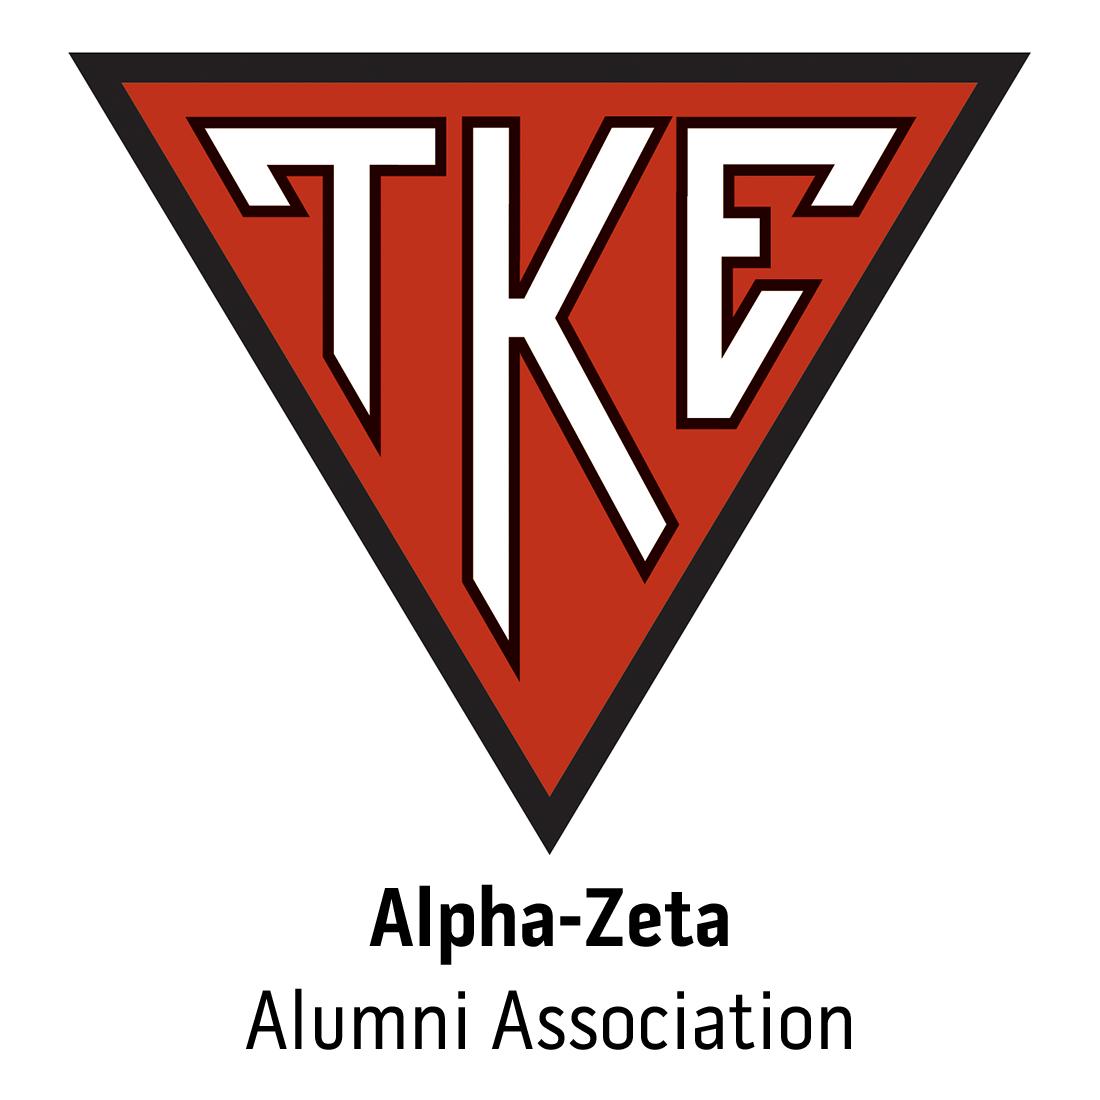 Alpha-Zeta Alumni Association for Purdue University